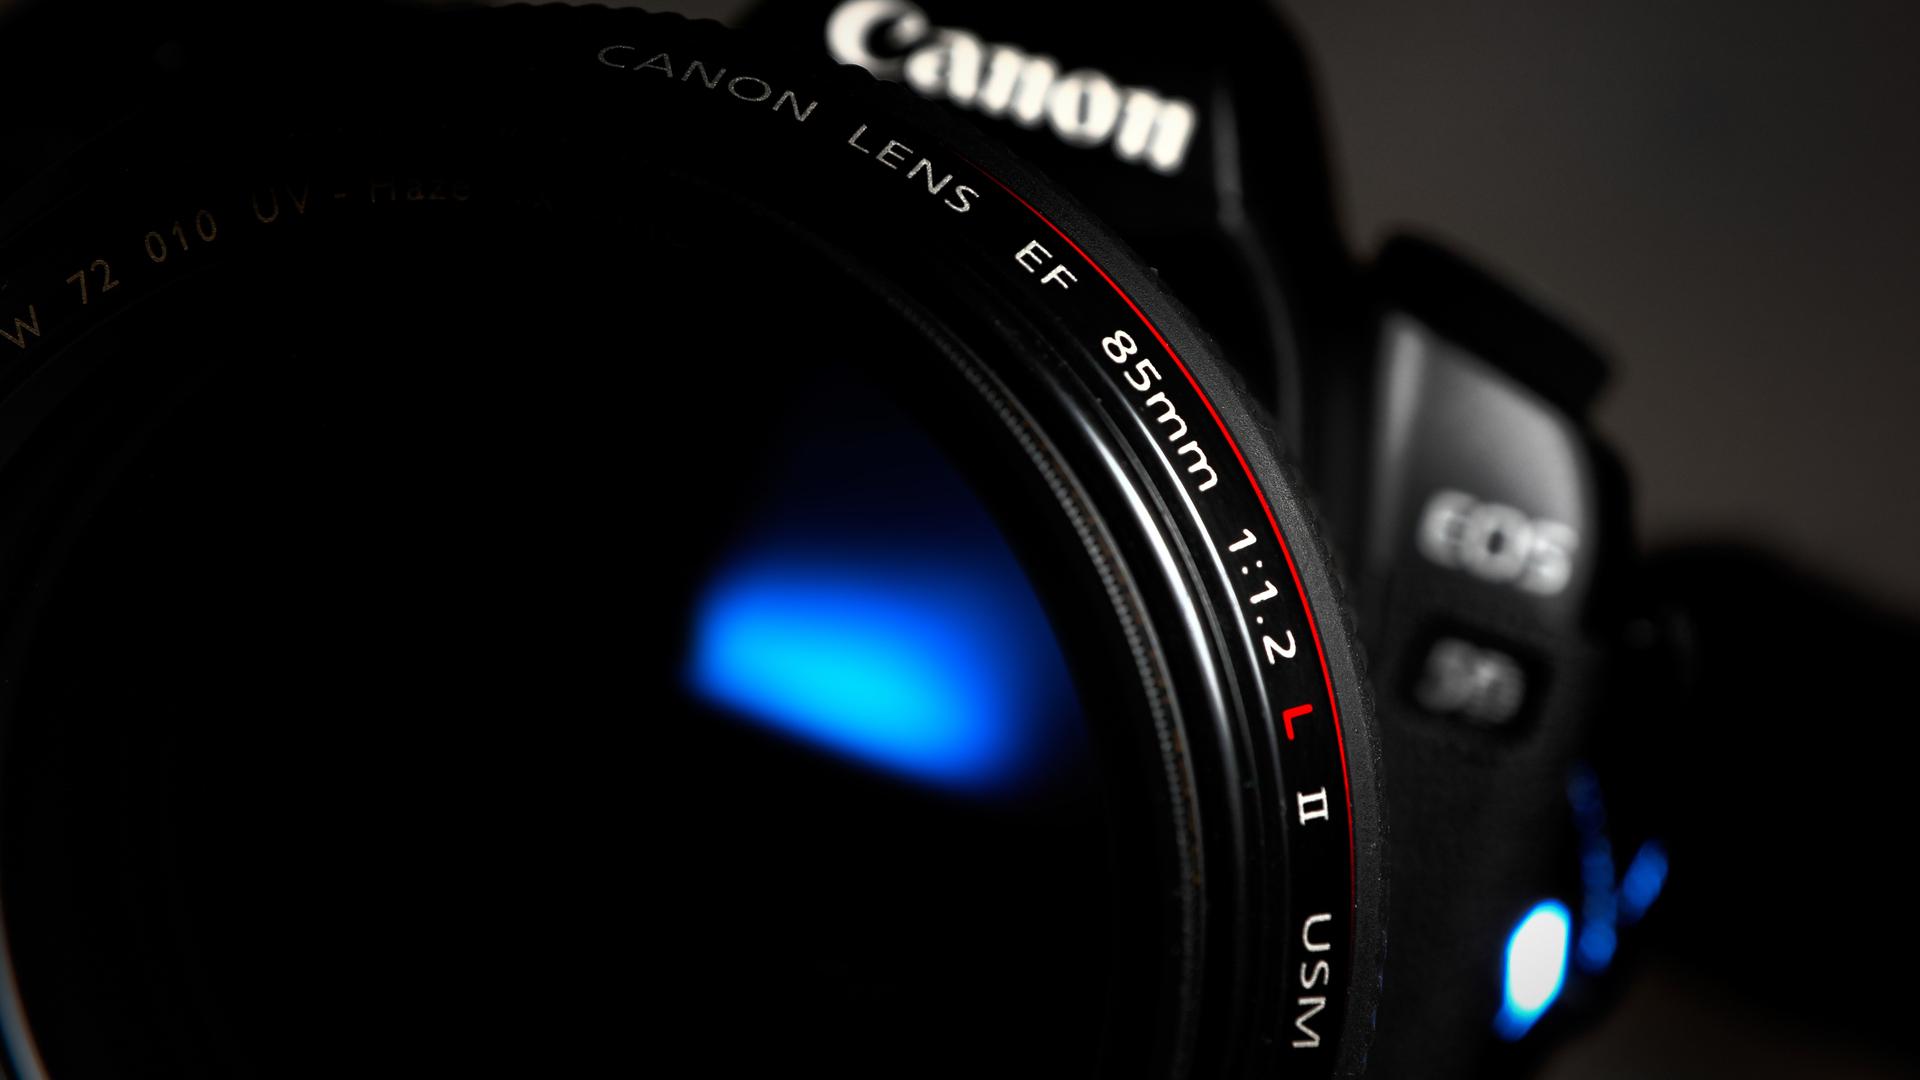 Hd wallpaper camera - Wallpaper Canon Camera Photography Wallpaper Hd Wallpapers High